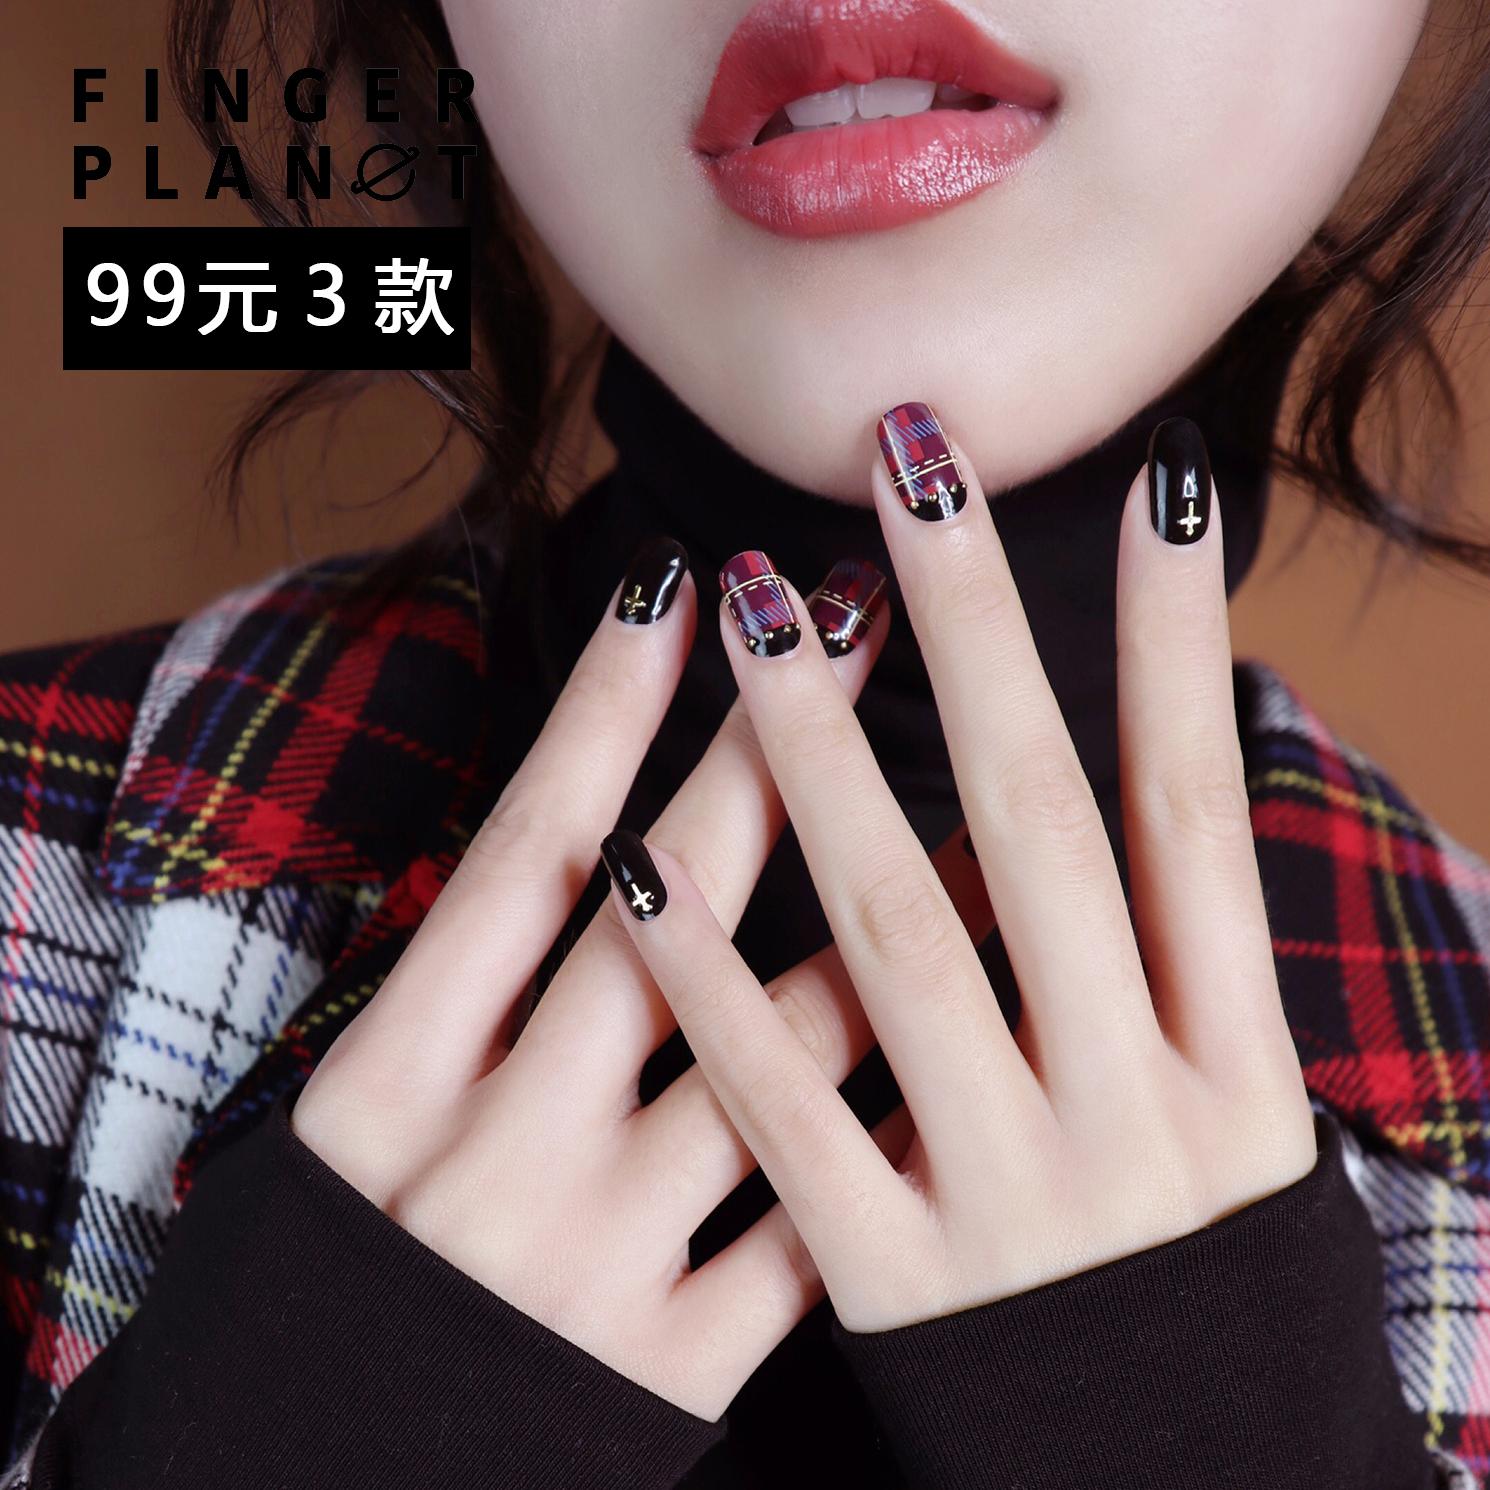 Planet FINGERPLANET Manicure Nail polish nail polish nail polish nail nail Christmas manicure